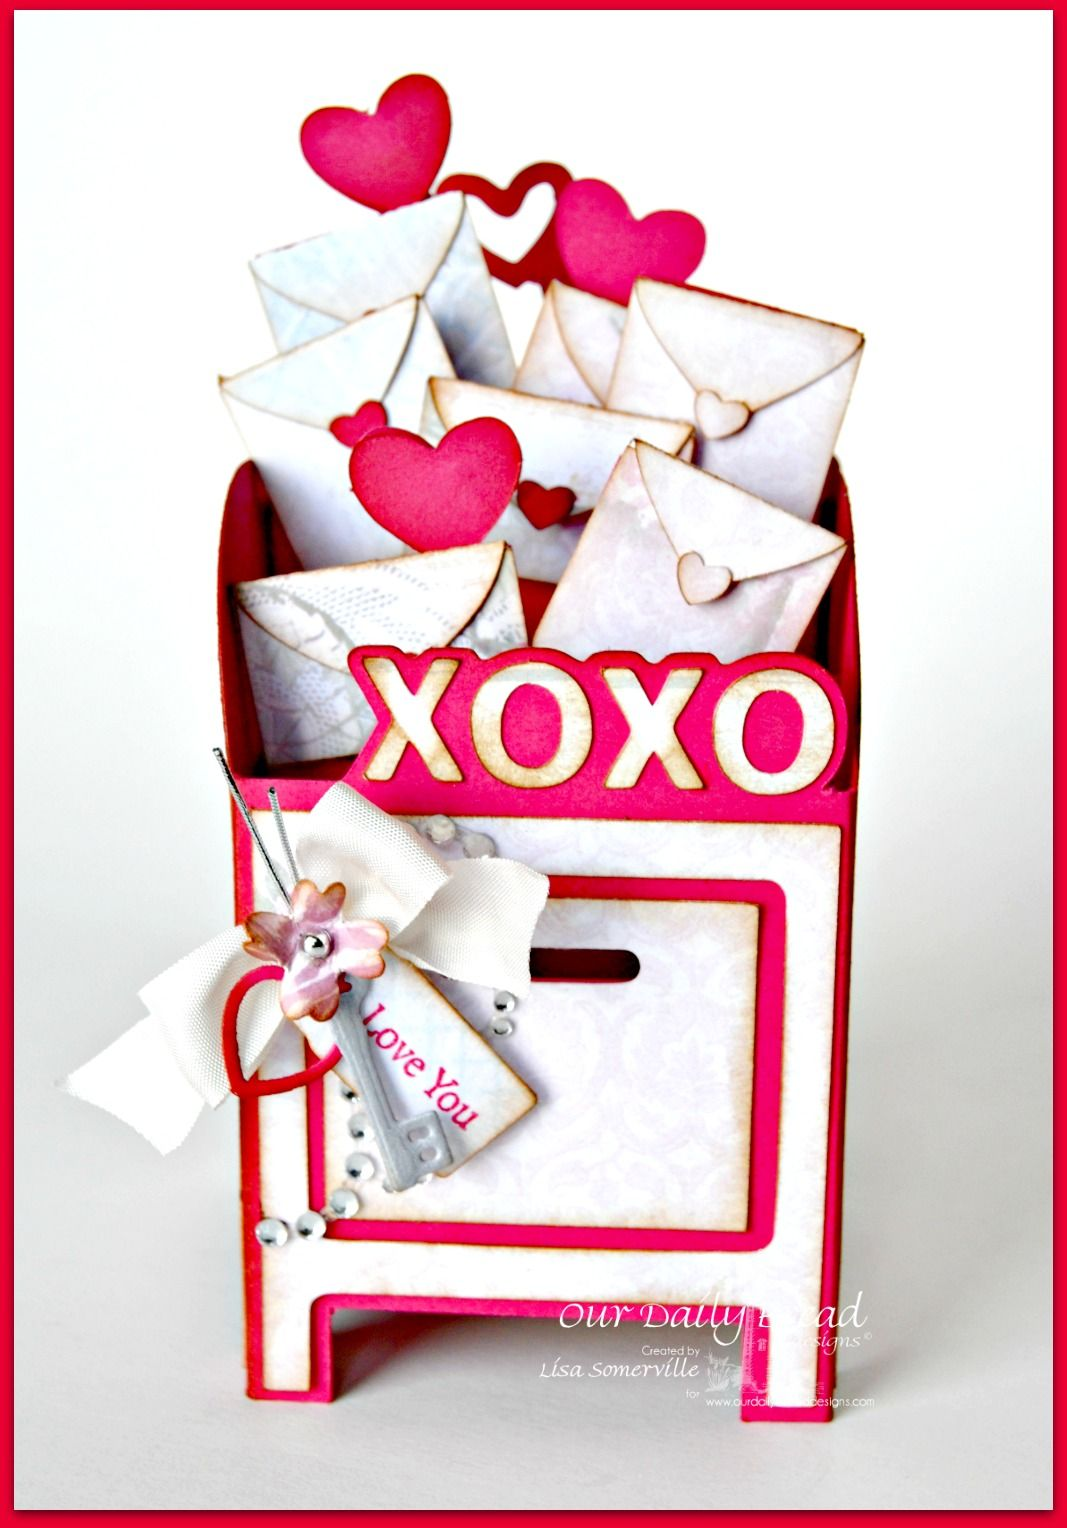 Designs by Lisa Somerville: Please Mr. Postman